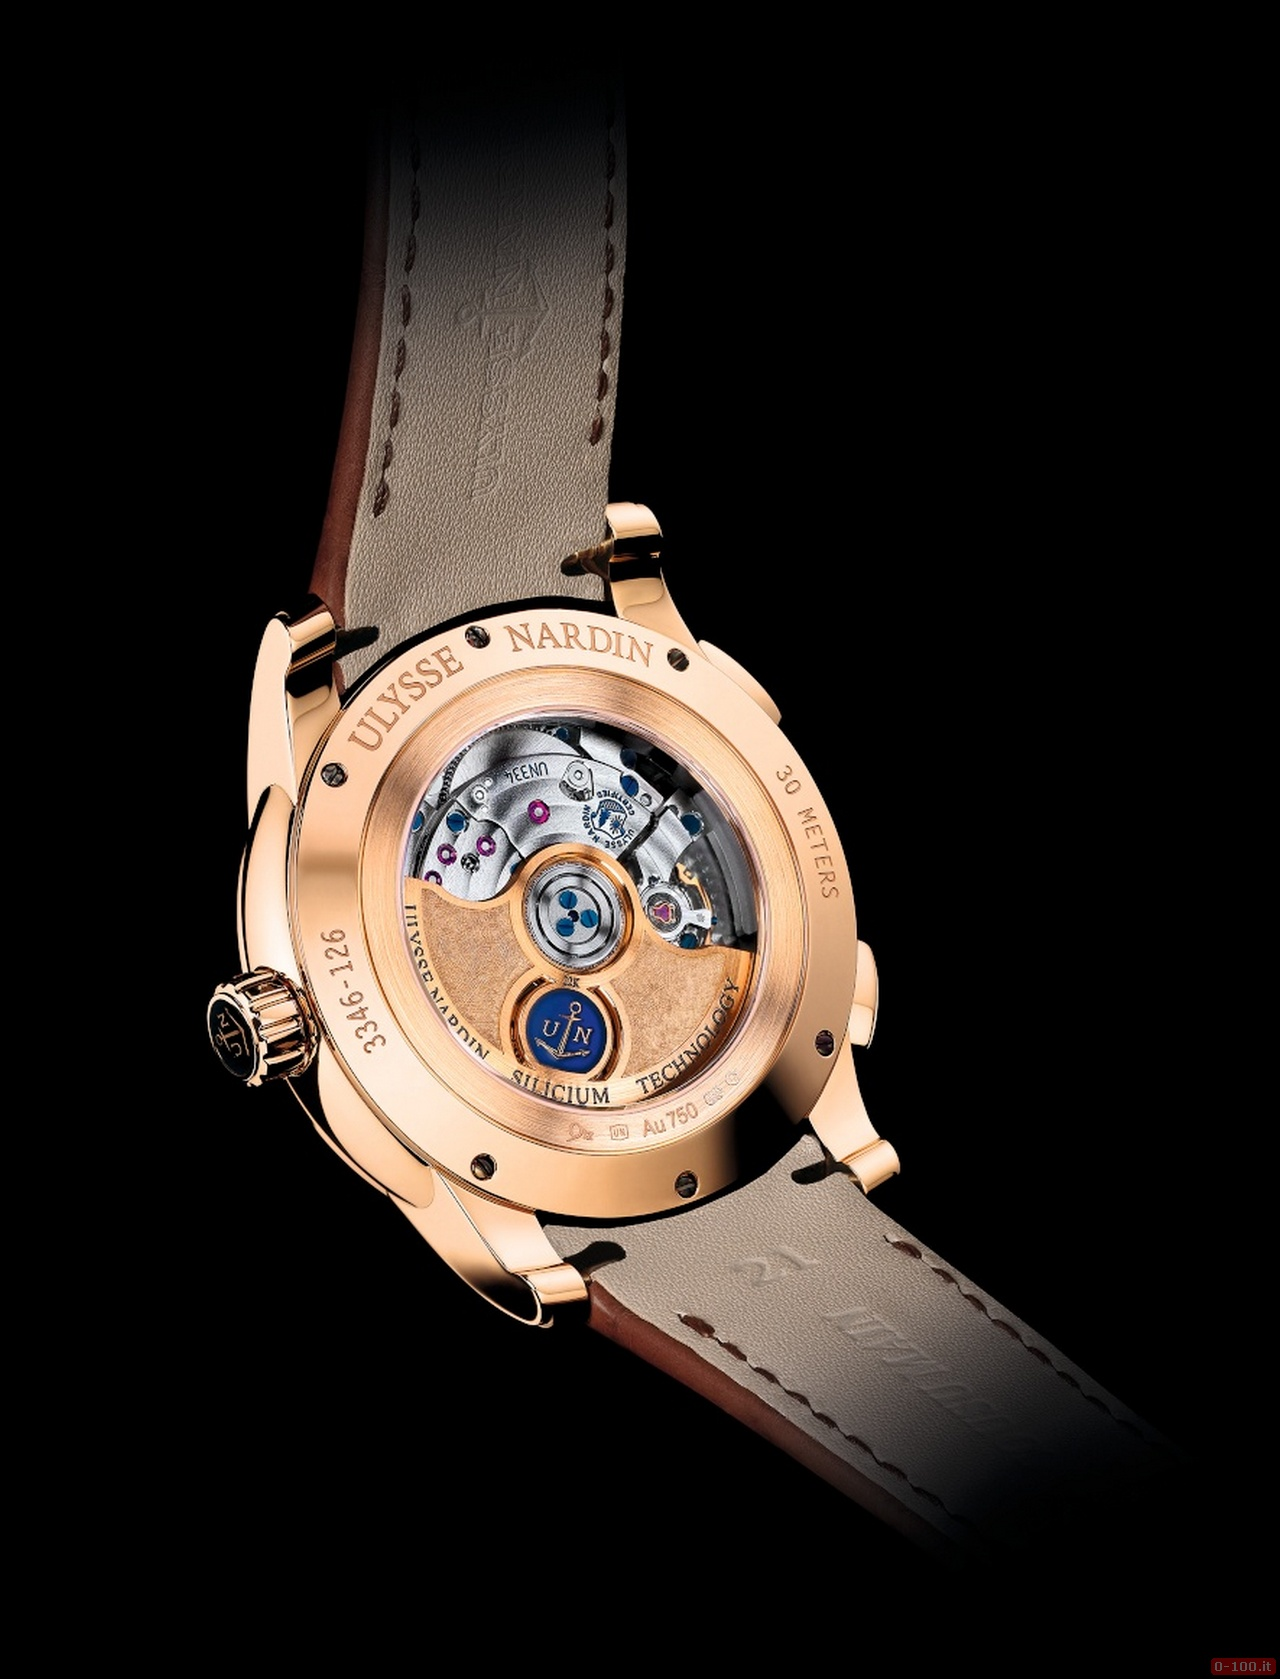 anteprima-baselworld-2014-ulysse-nardin-dual-time-manufacture_0-1008